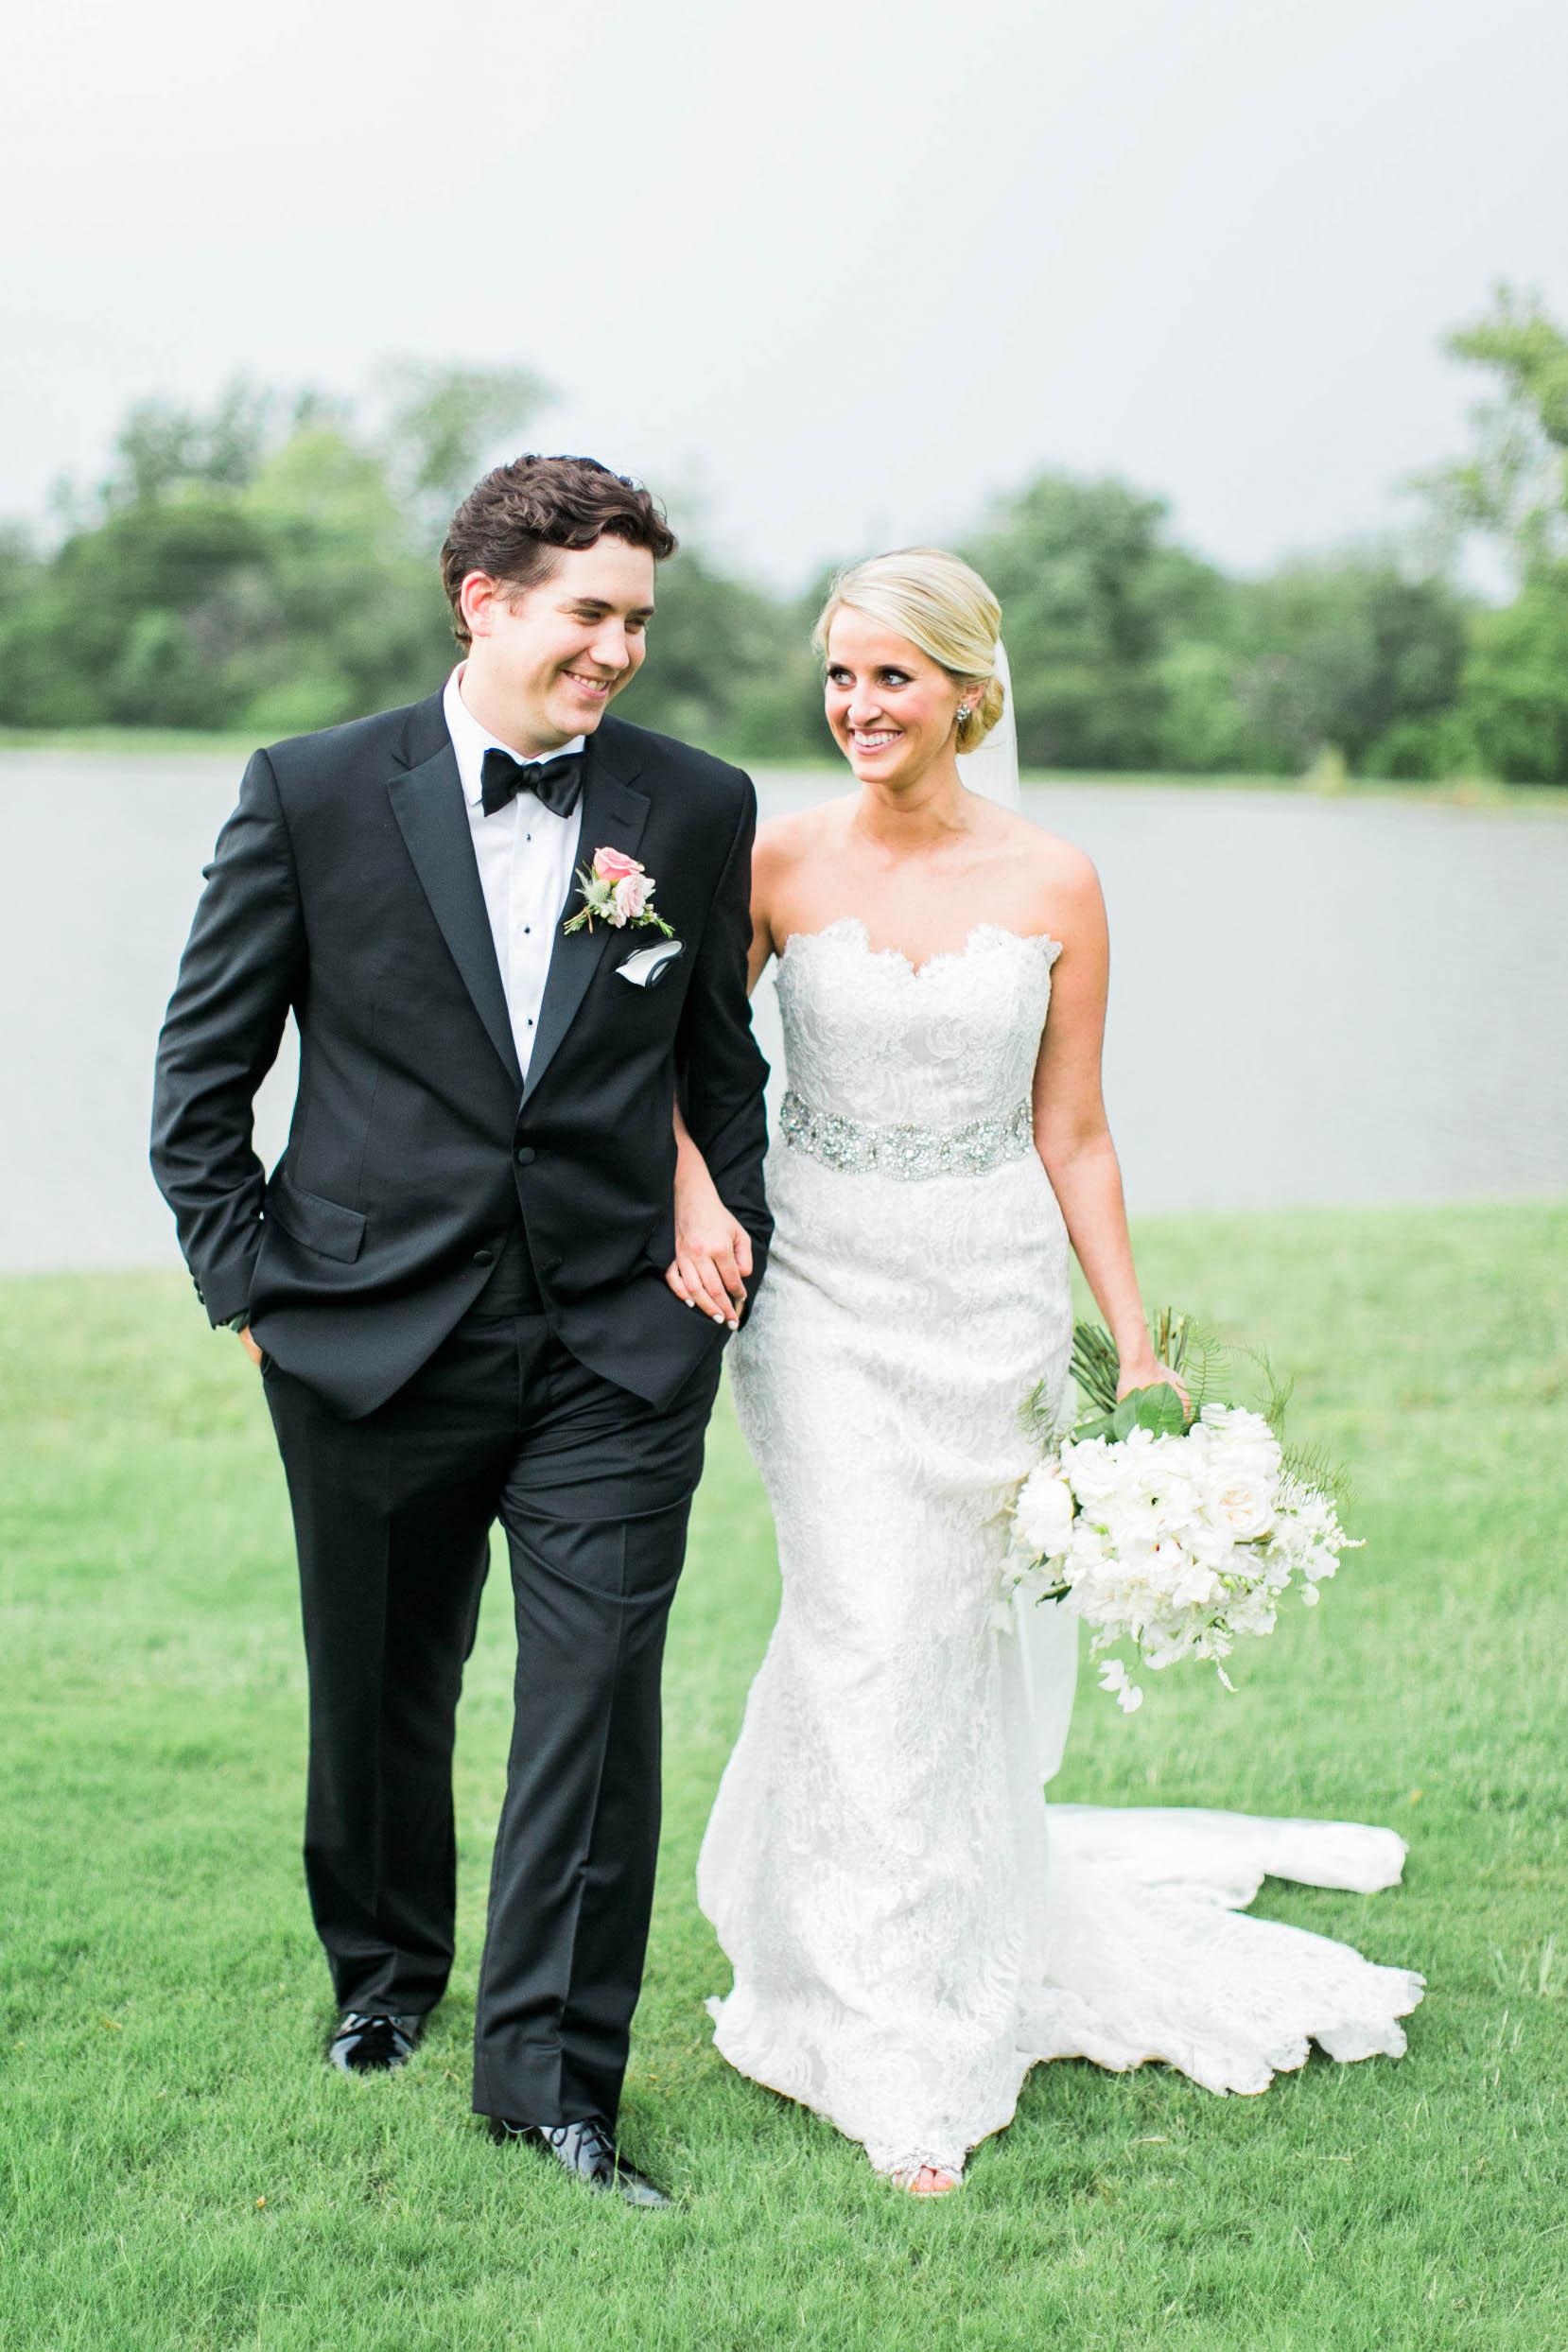 TEXAS BARN WEDDING:  MORGAN + PETER